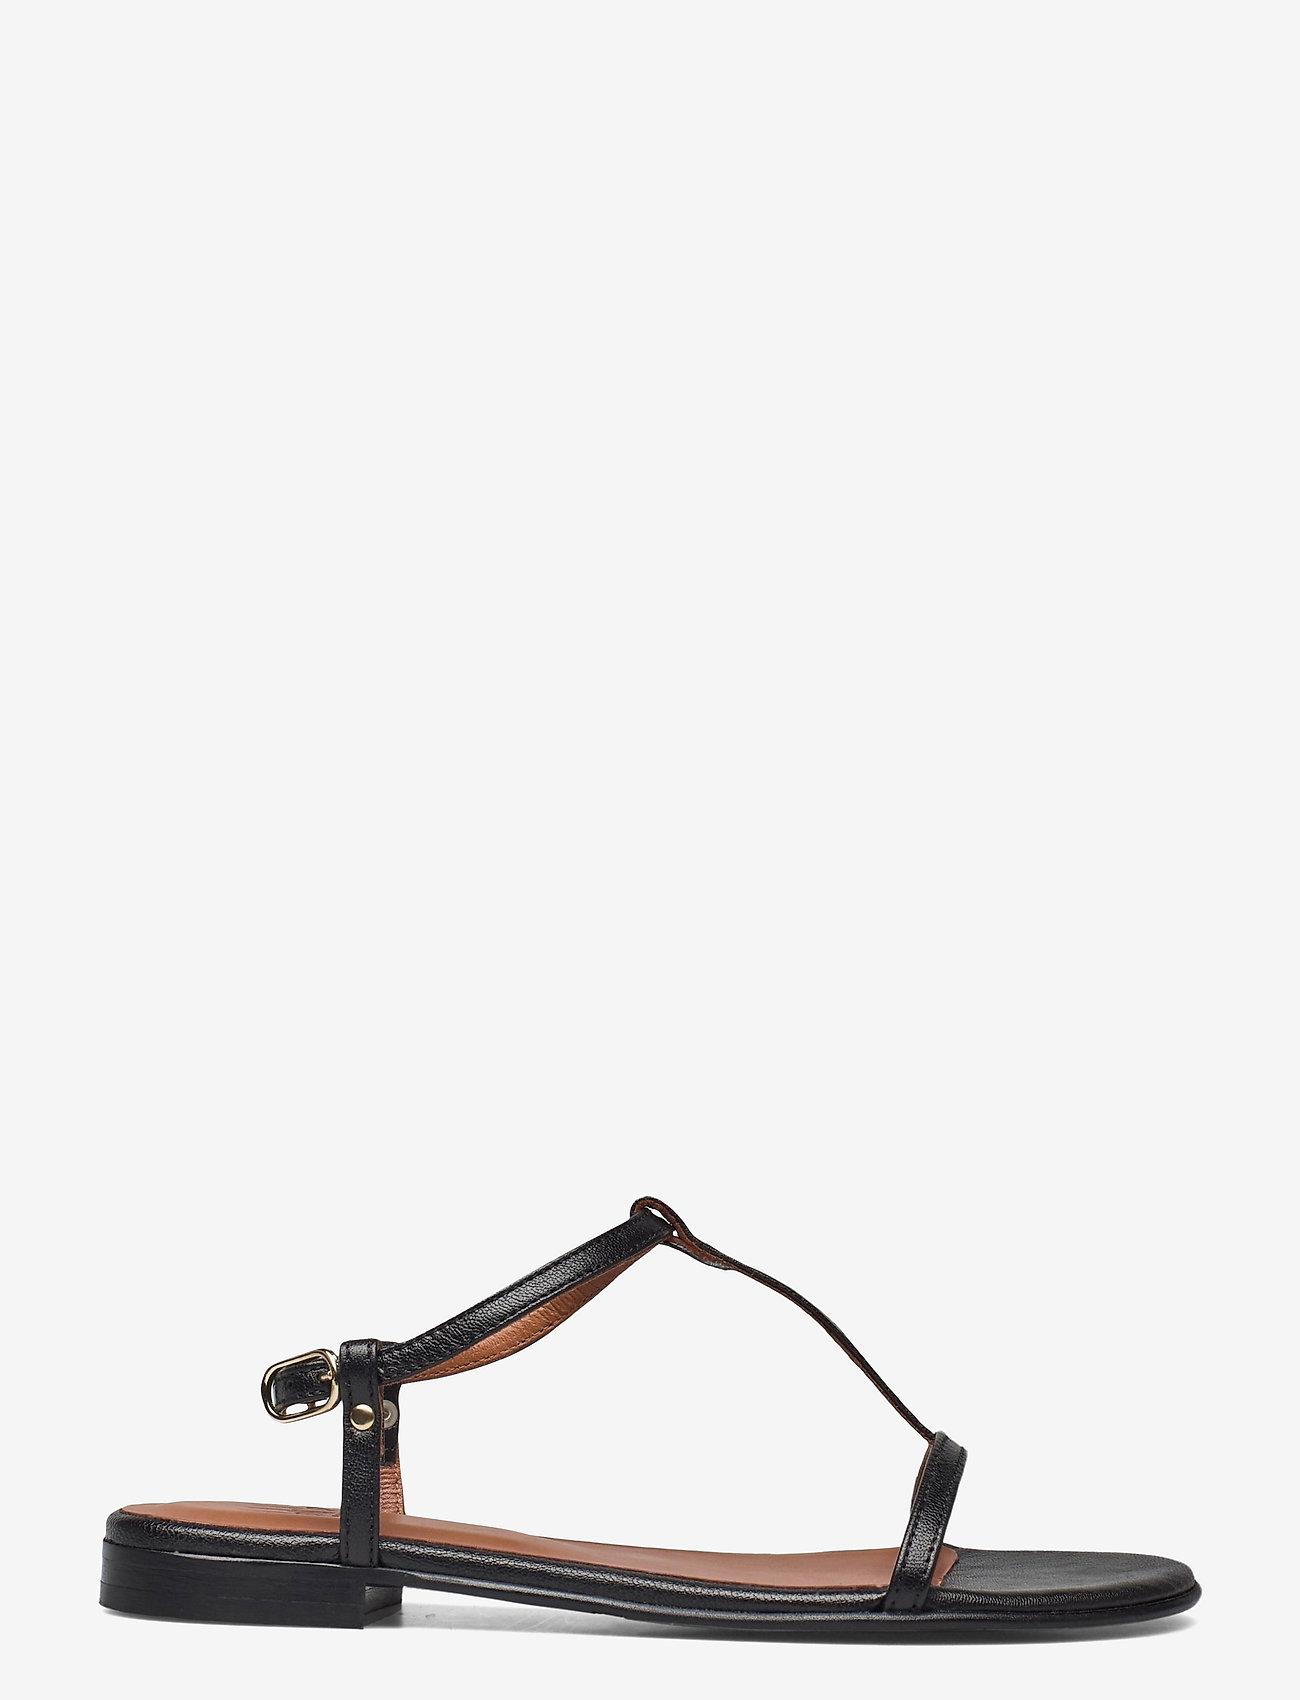 Billi Bi - SANDALS - zempapēžu sandales - black metal nappa 700 - 1